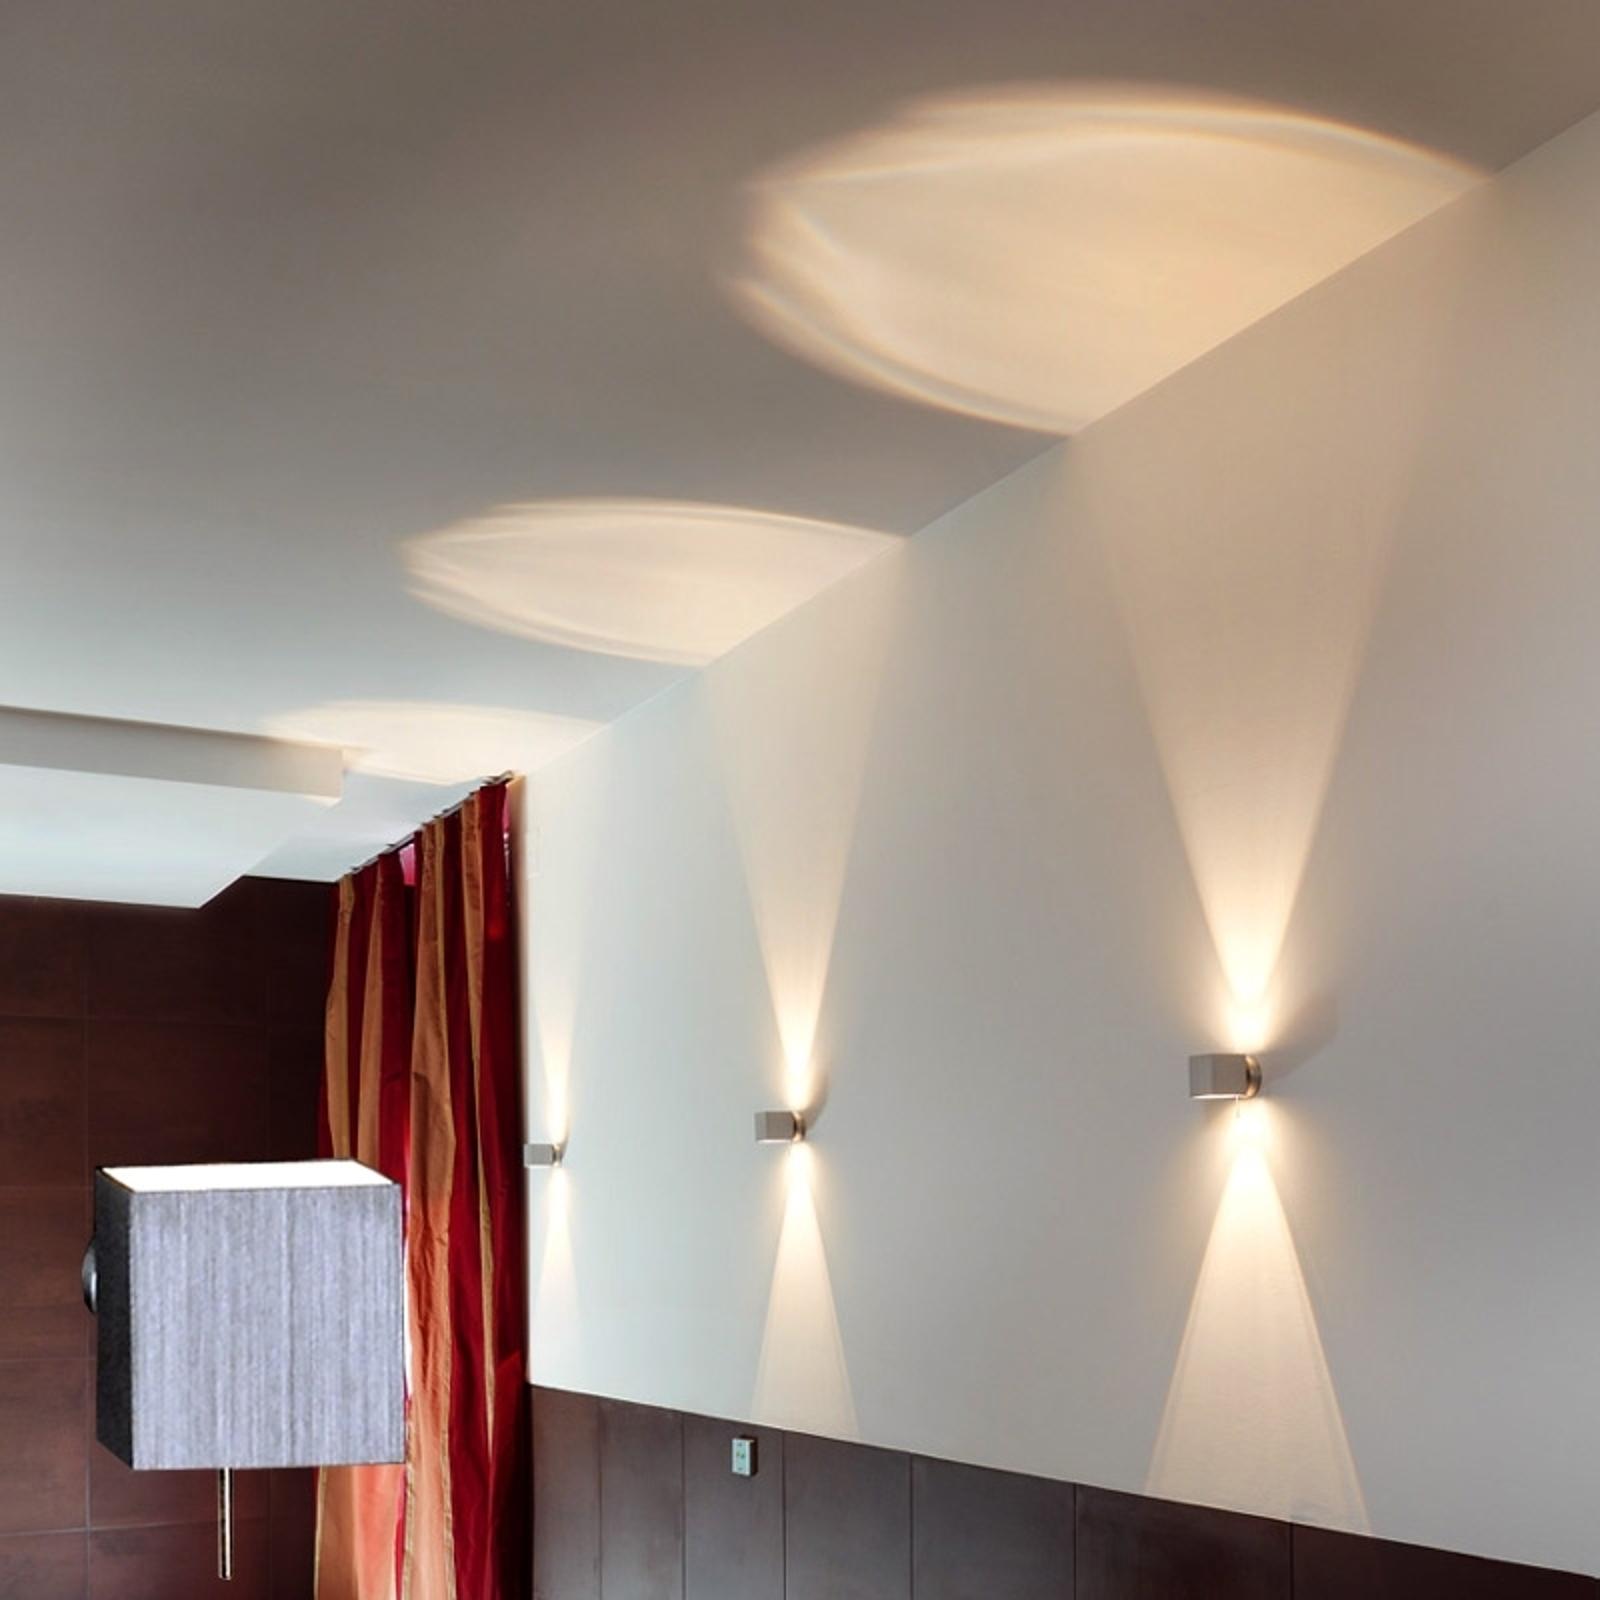 Obrotowa lampa ścienna LELY